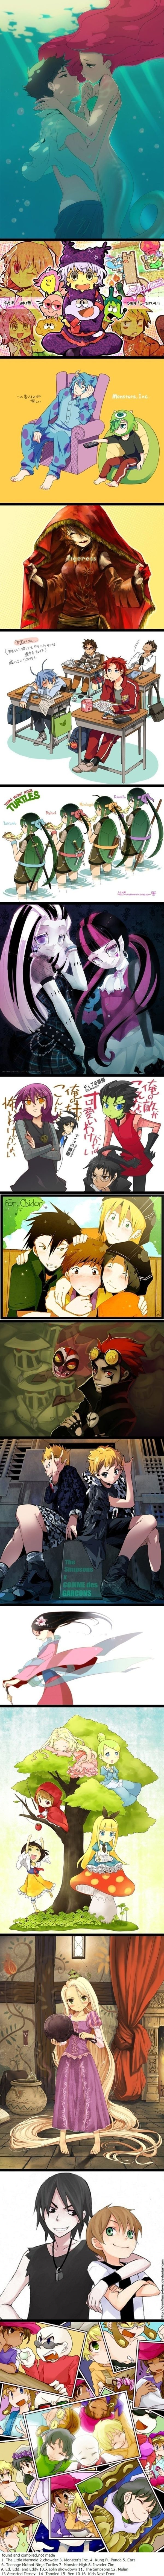 es de pelicula a anime